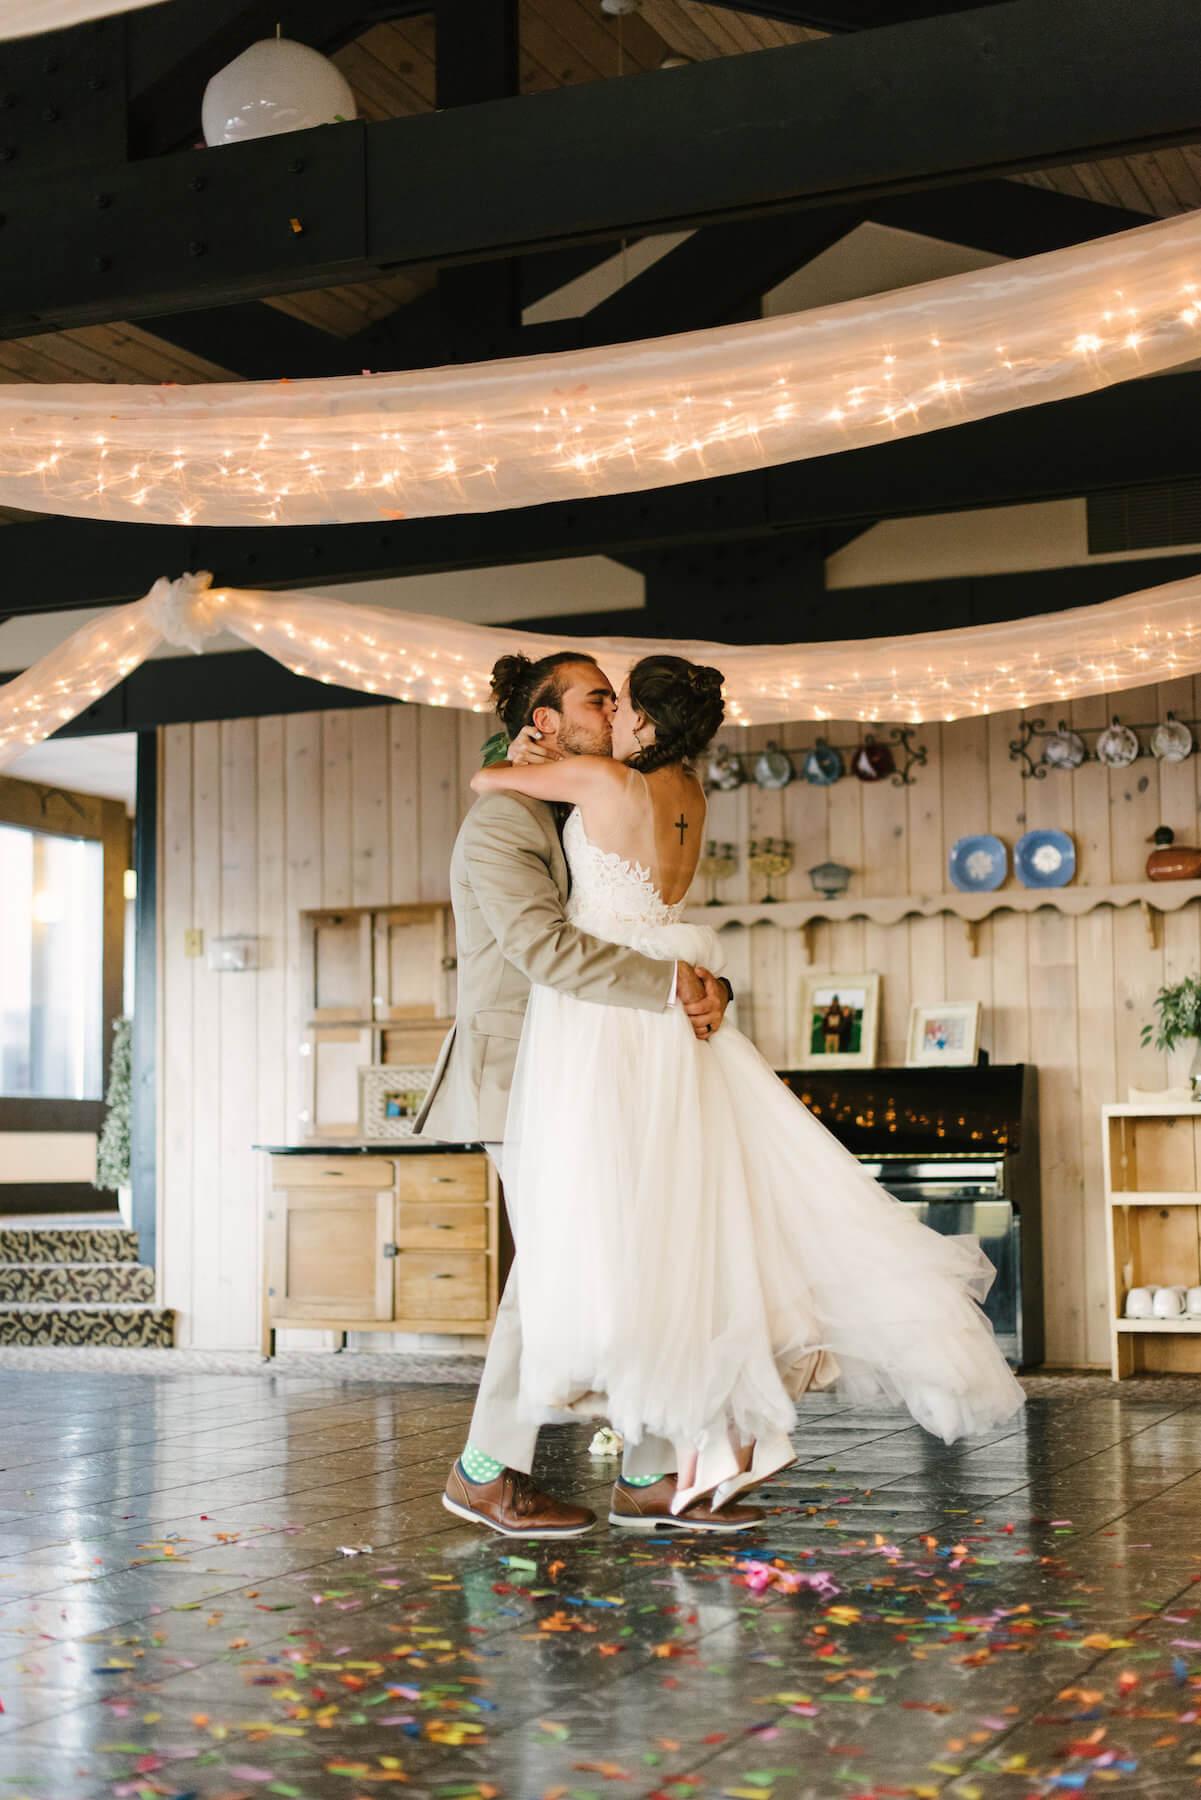 engle-olson-wedding-blair-taylor-1.jpg